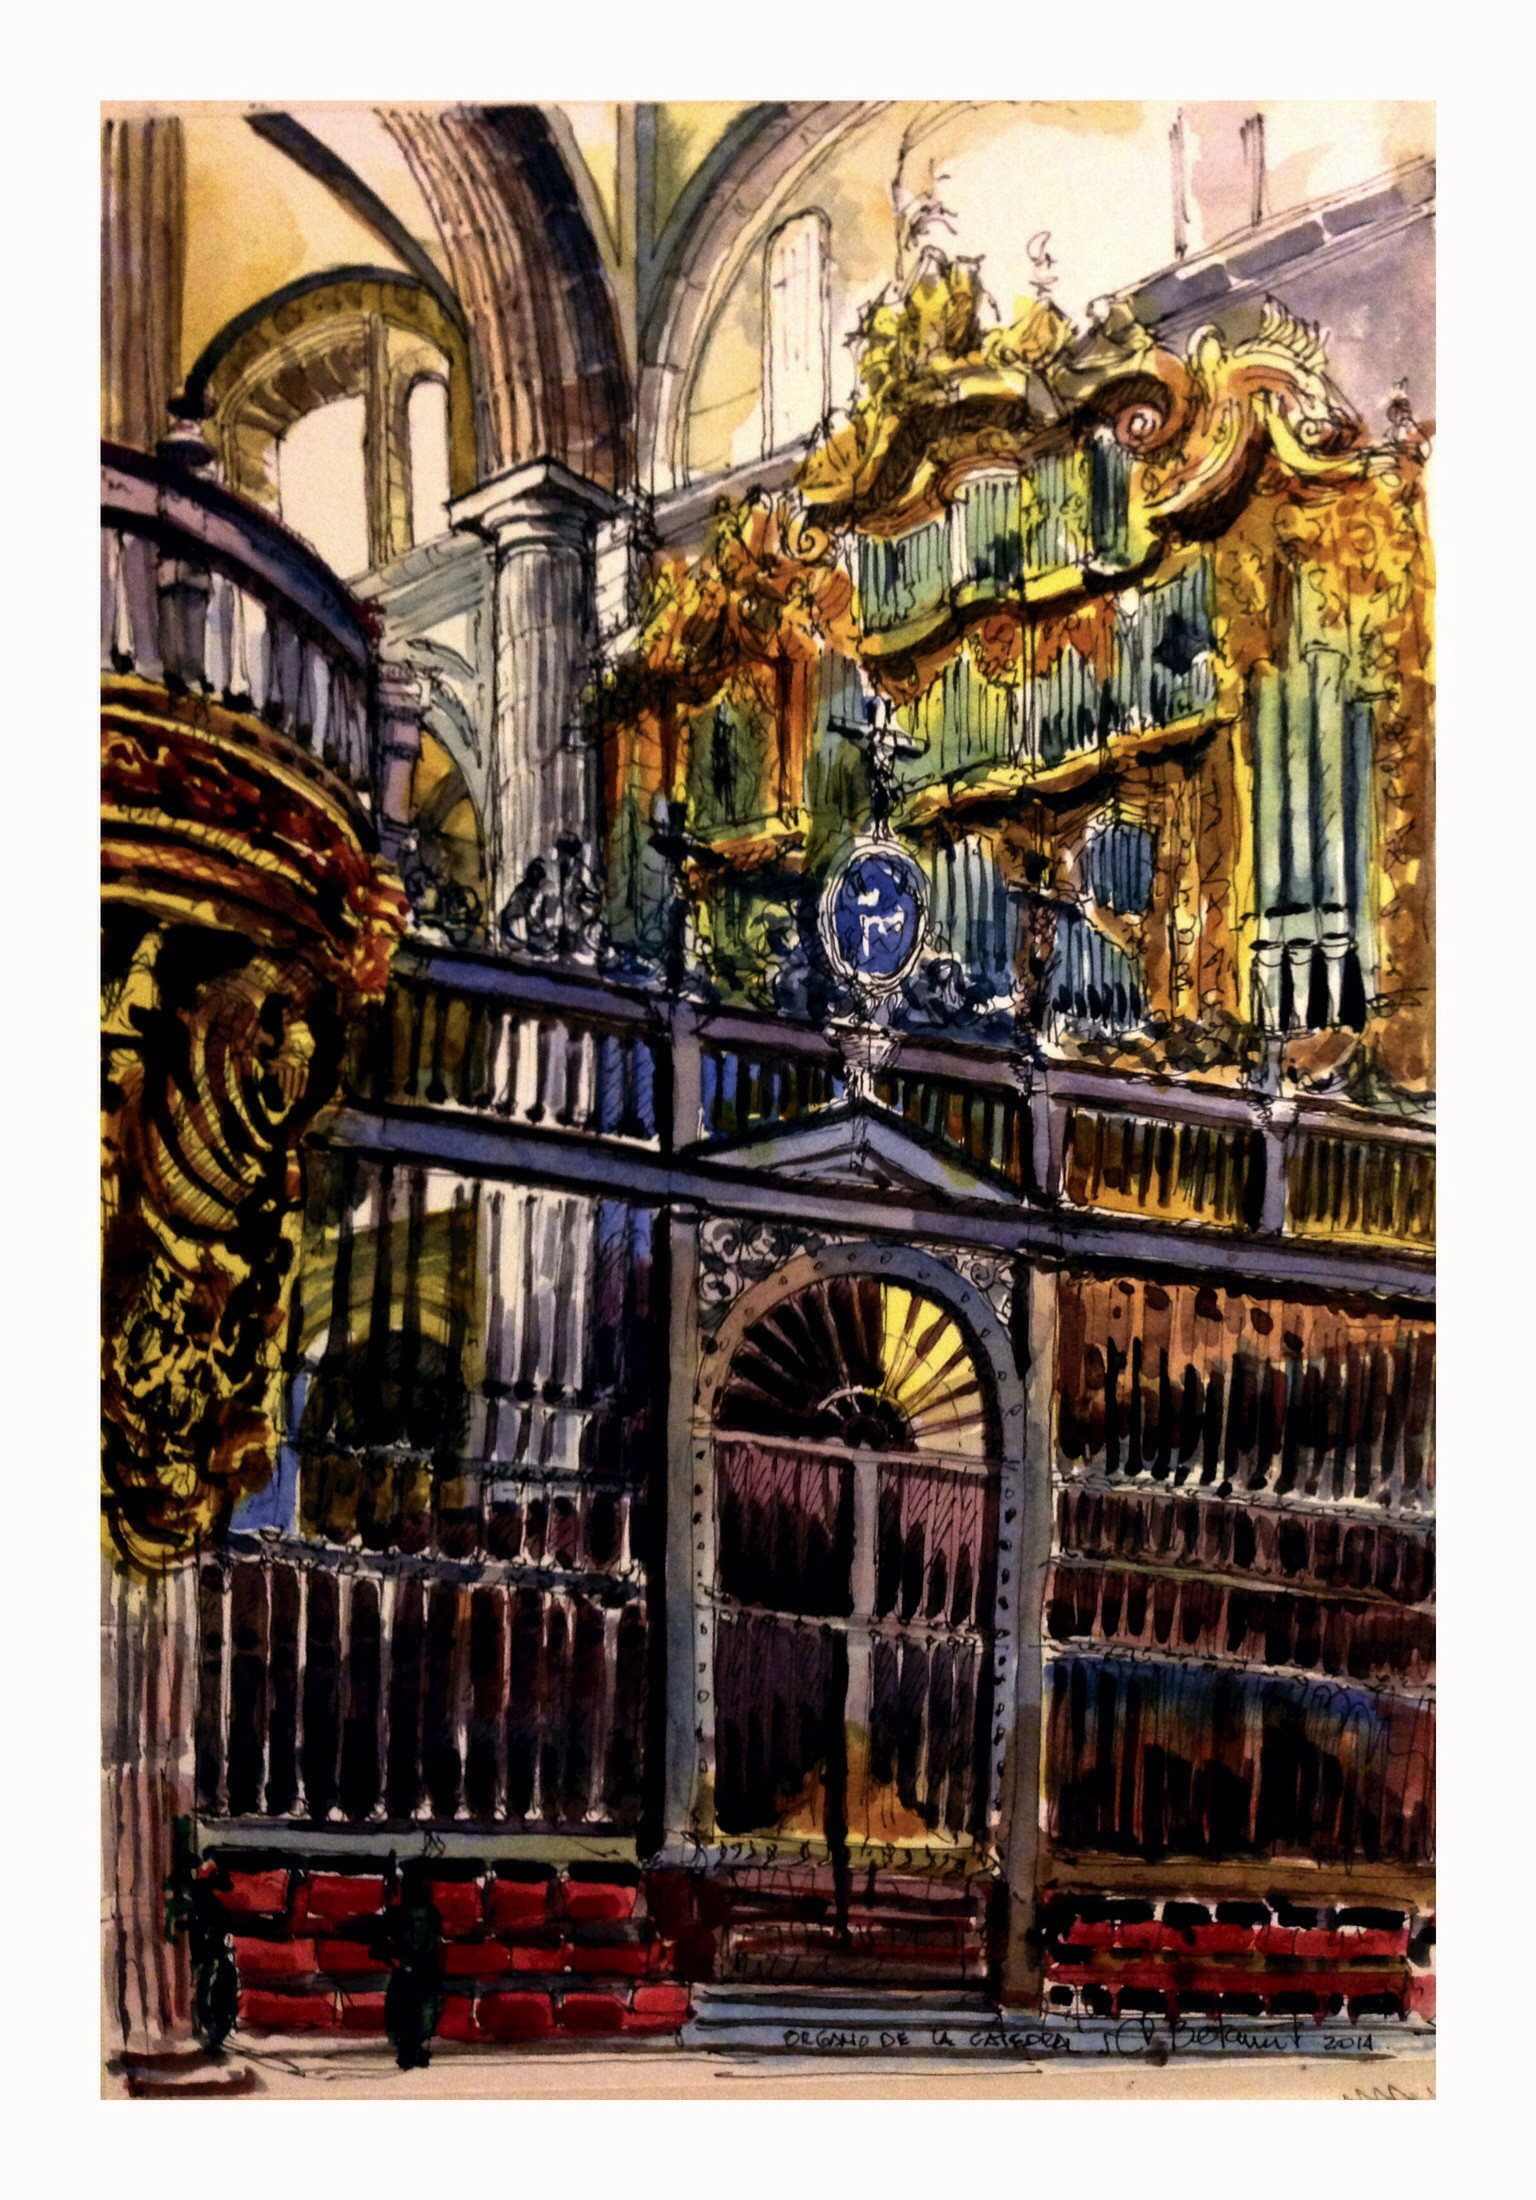 Órgano de La Catedral Metropolitana!